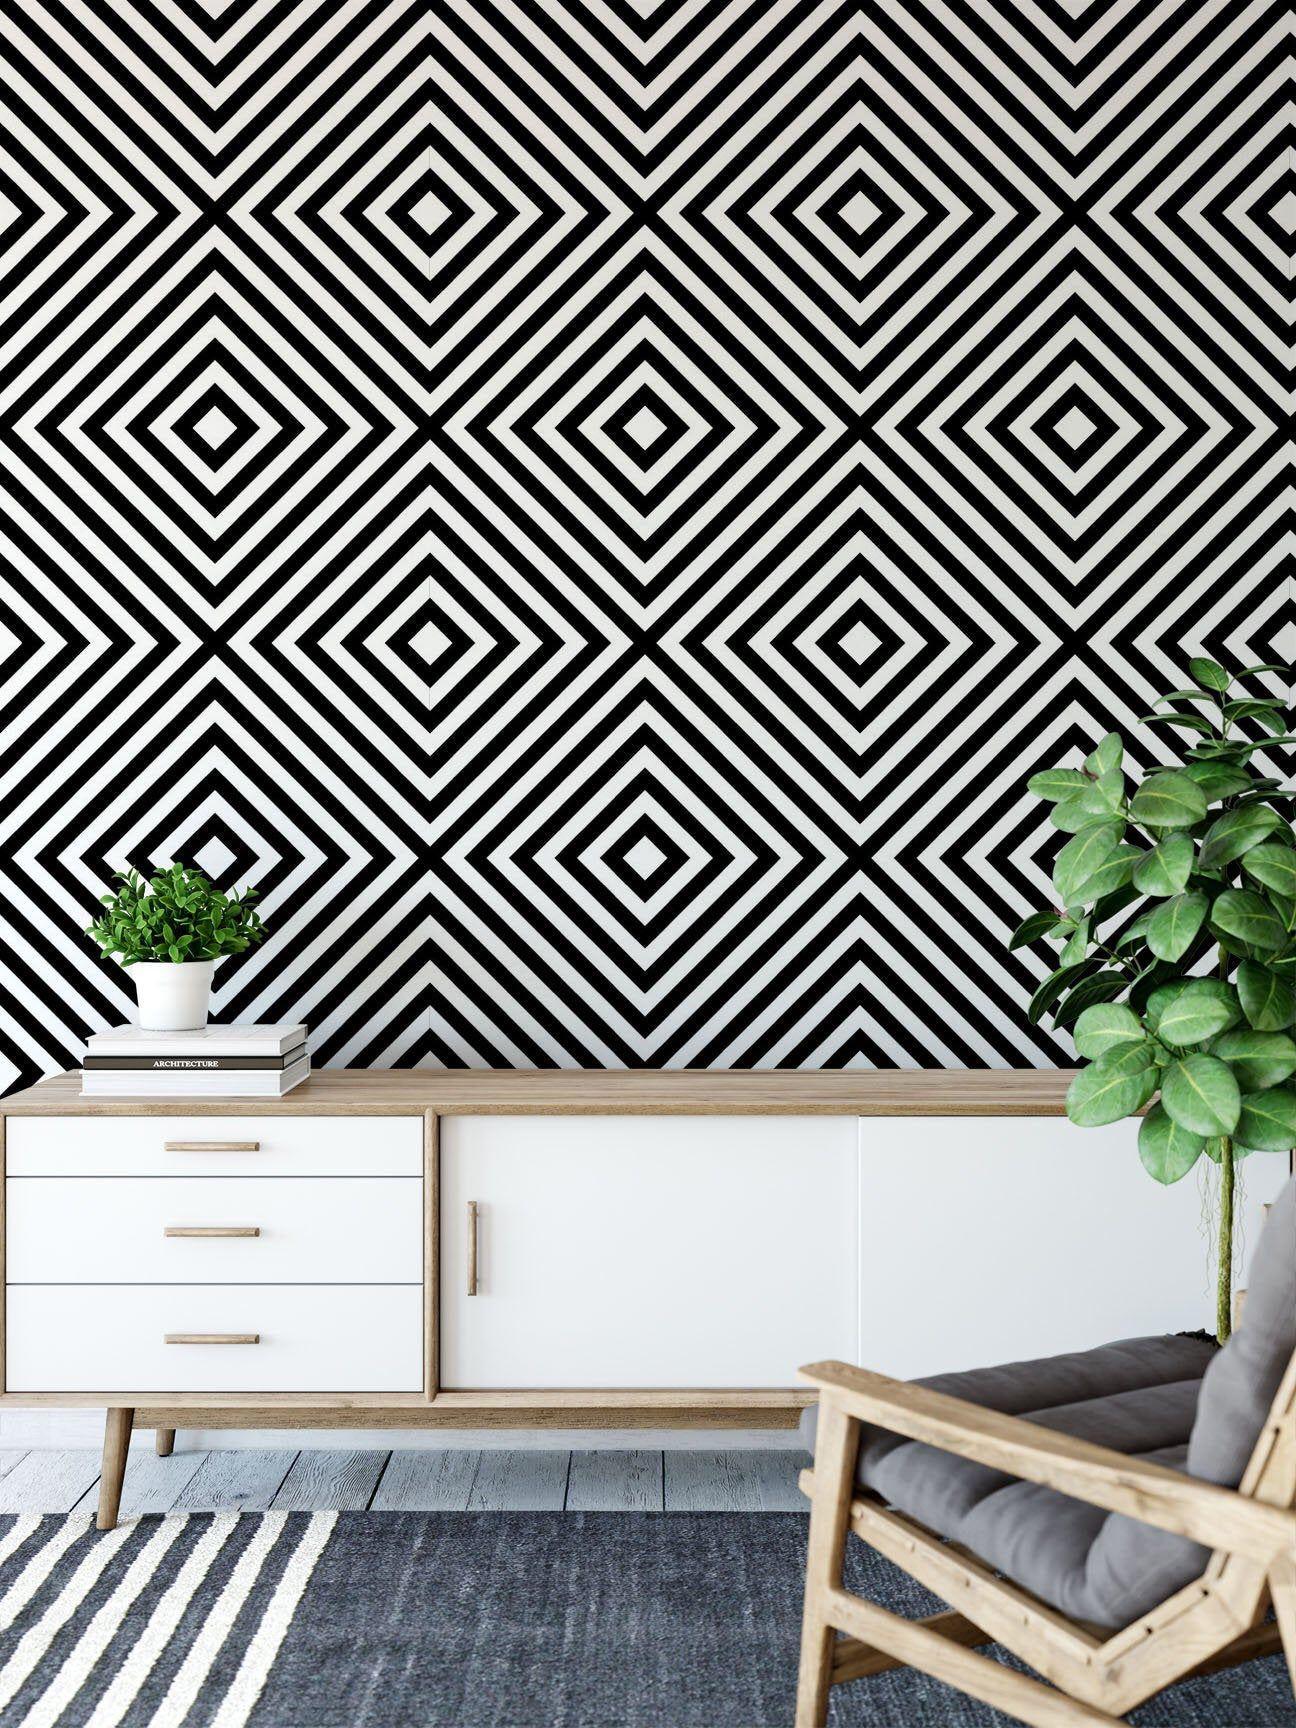 Geometric Wallpaper Removable Wallpaper Modern Wallpaper Bathroom Wallpaper Peel And Stick Self Adhesive Wallpaper 127 Modern Wallpaper Geometric Wallpaper Removable Wallpaper